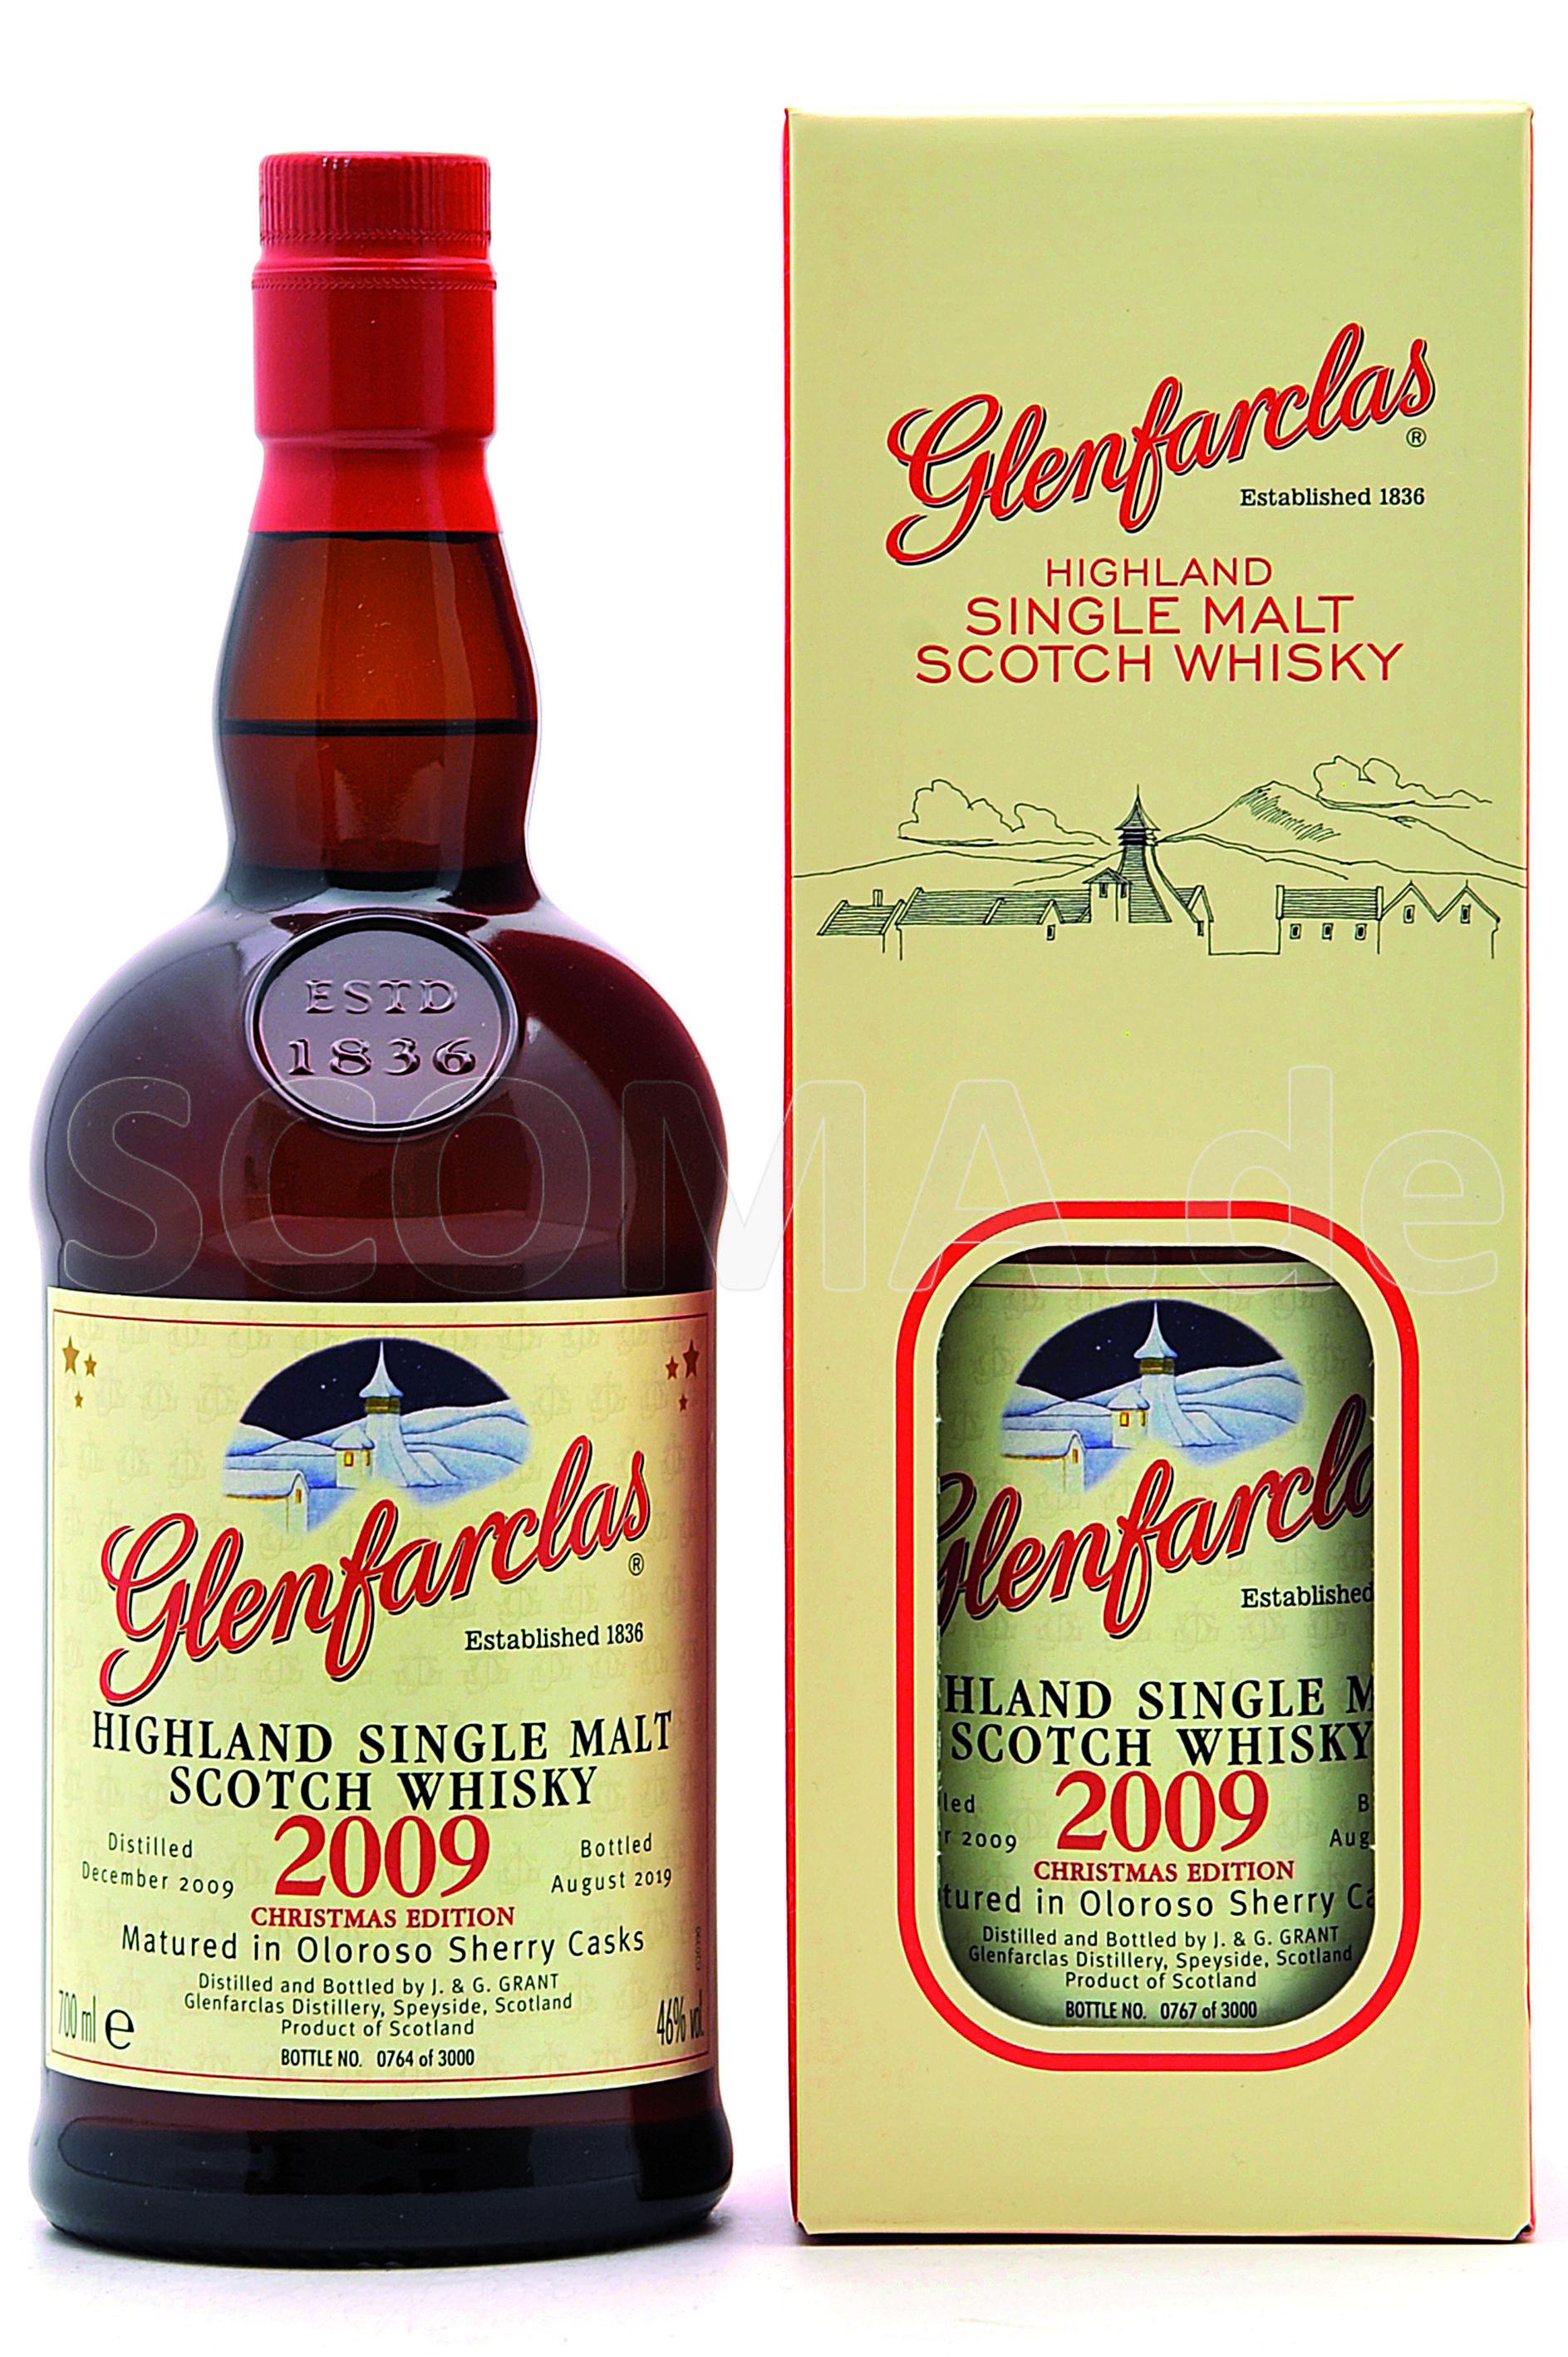 Glenfarclas 2009/2019 Christma...